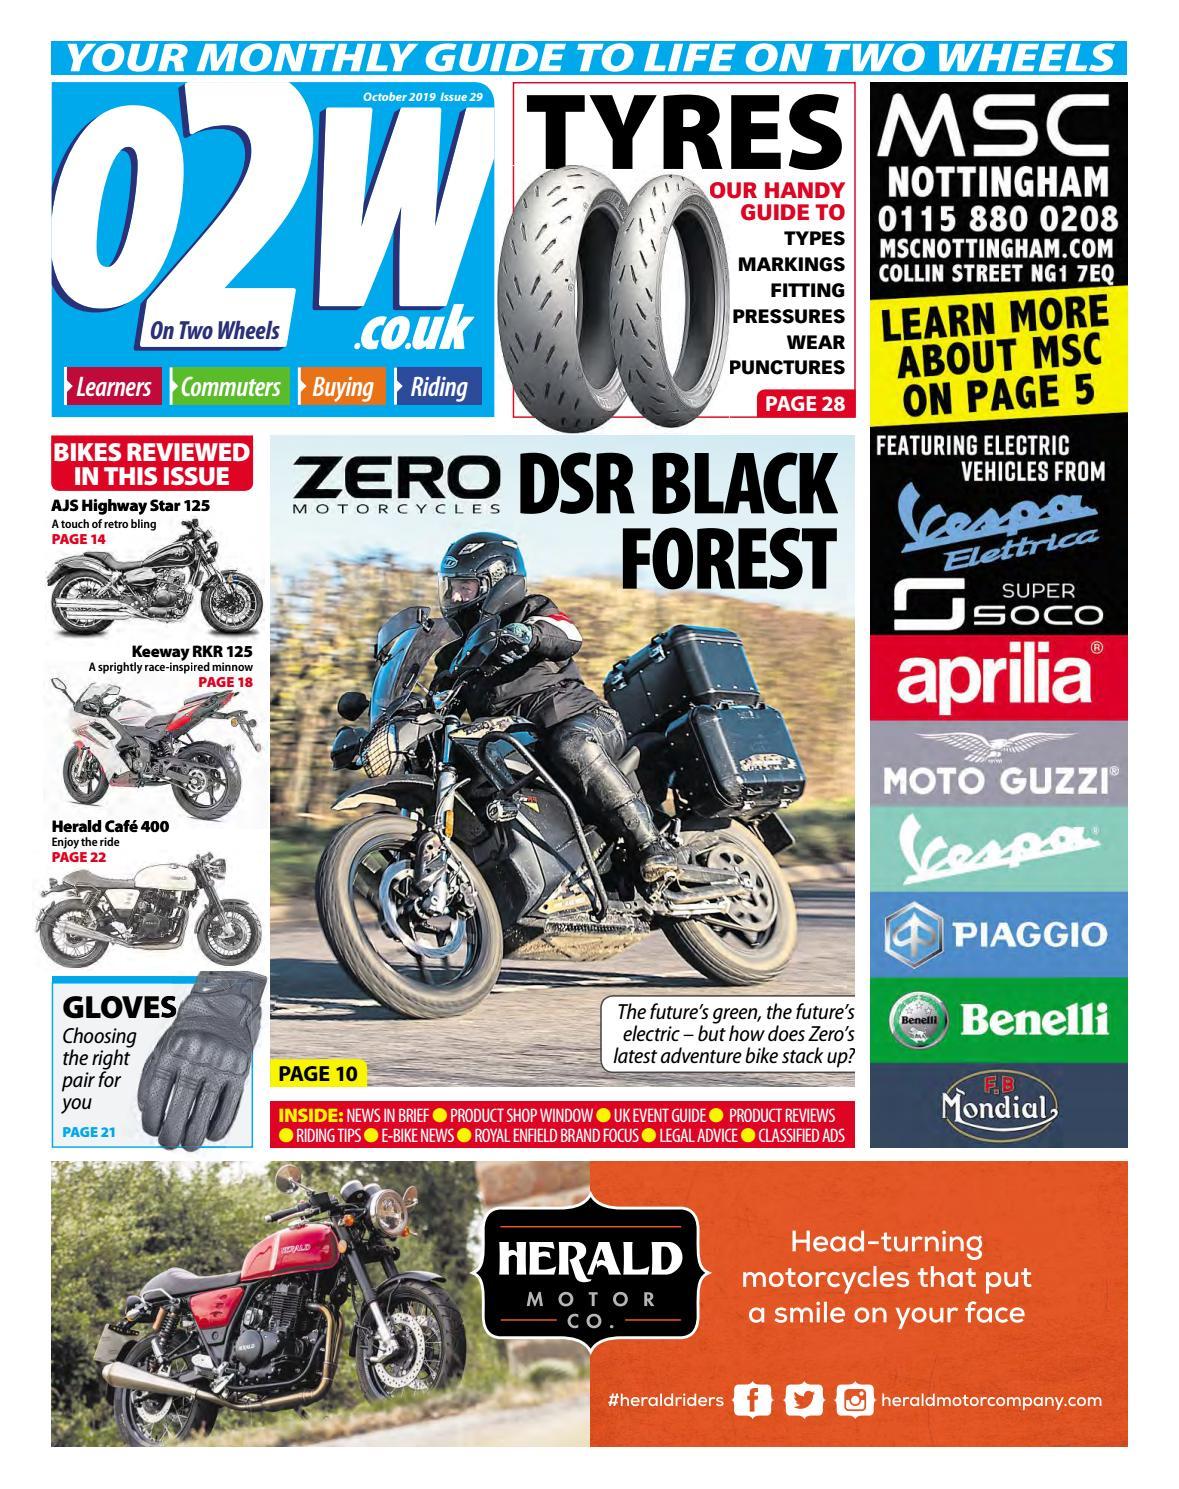 KAWASAKI VERSYS 650 Oxford Motorcycle Cover Breathable Motorbike Black Grey